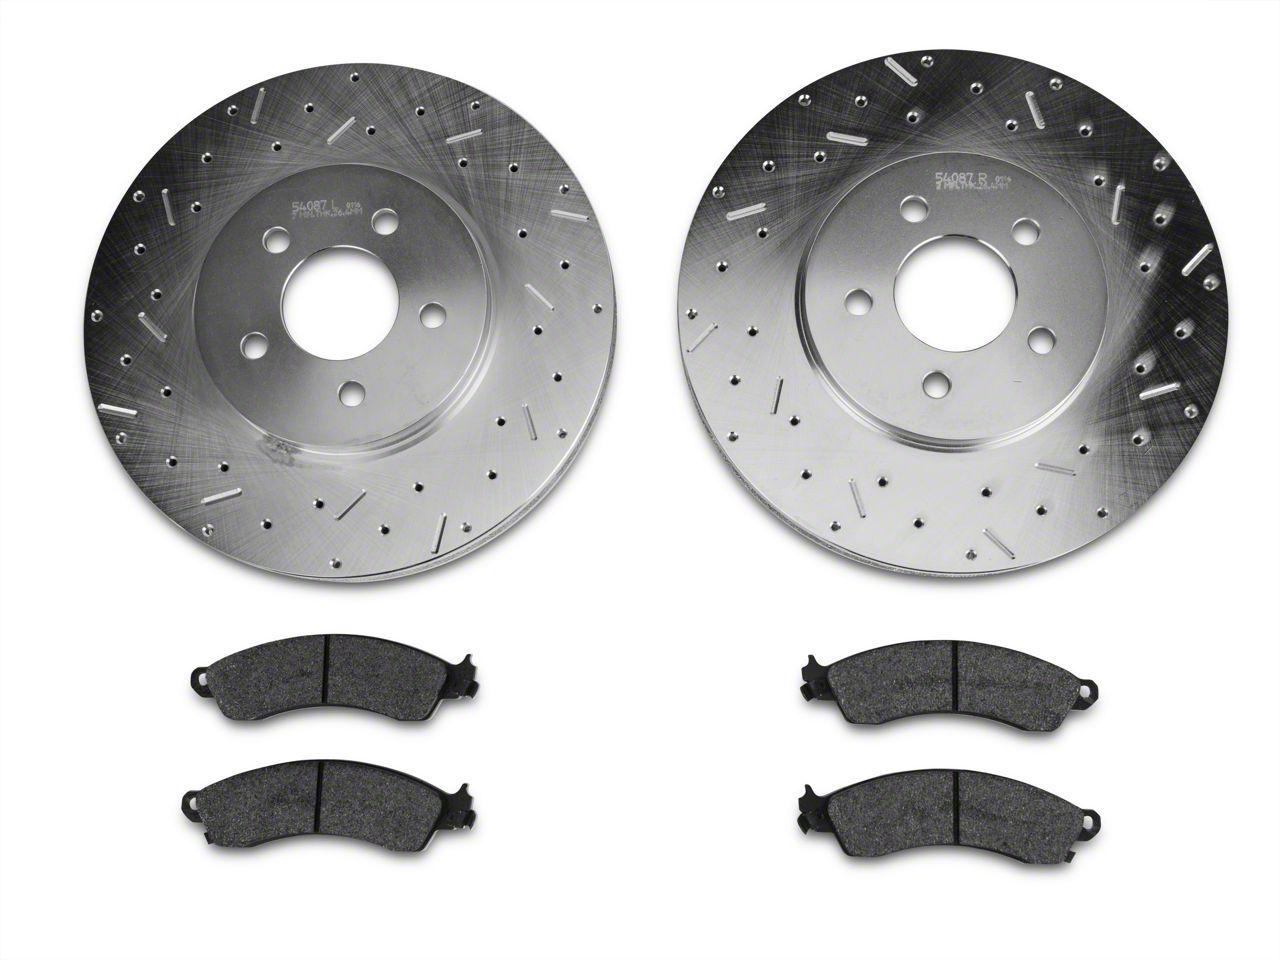 Xtreme Stop Precision Cross-Drilled & Slotted Rotors w/ Carbon Graphite Brake Pad Kit - Front (94-04 Cobra, Bullitt, Mach 1)